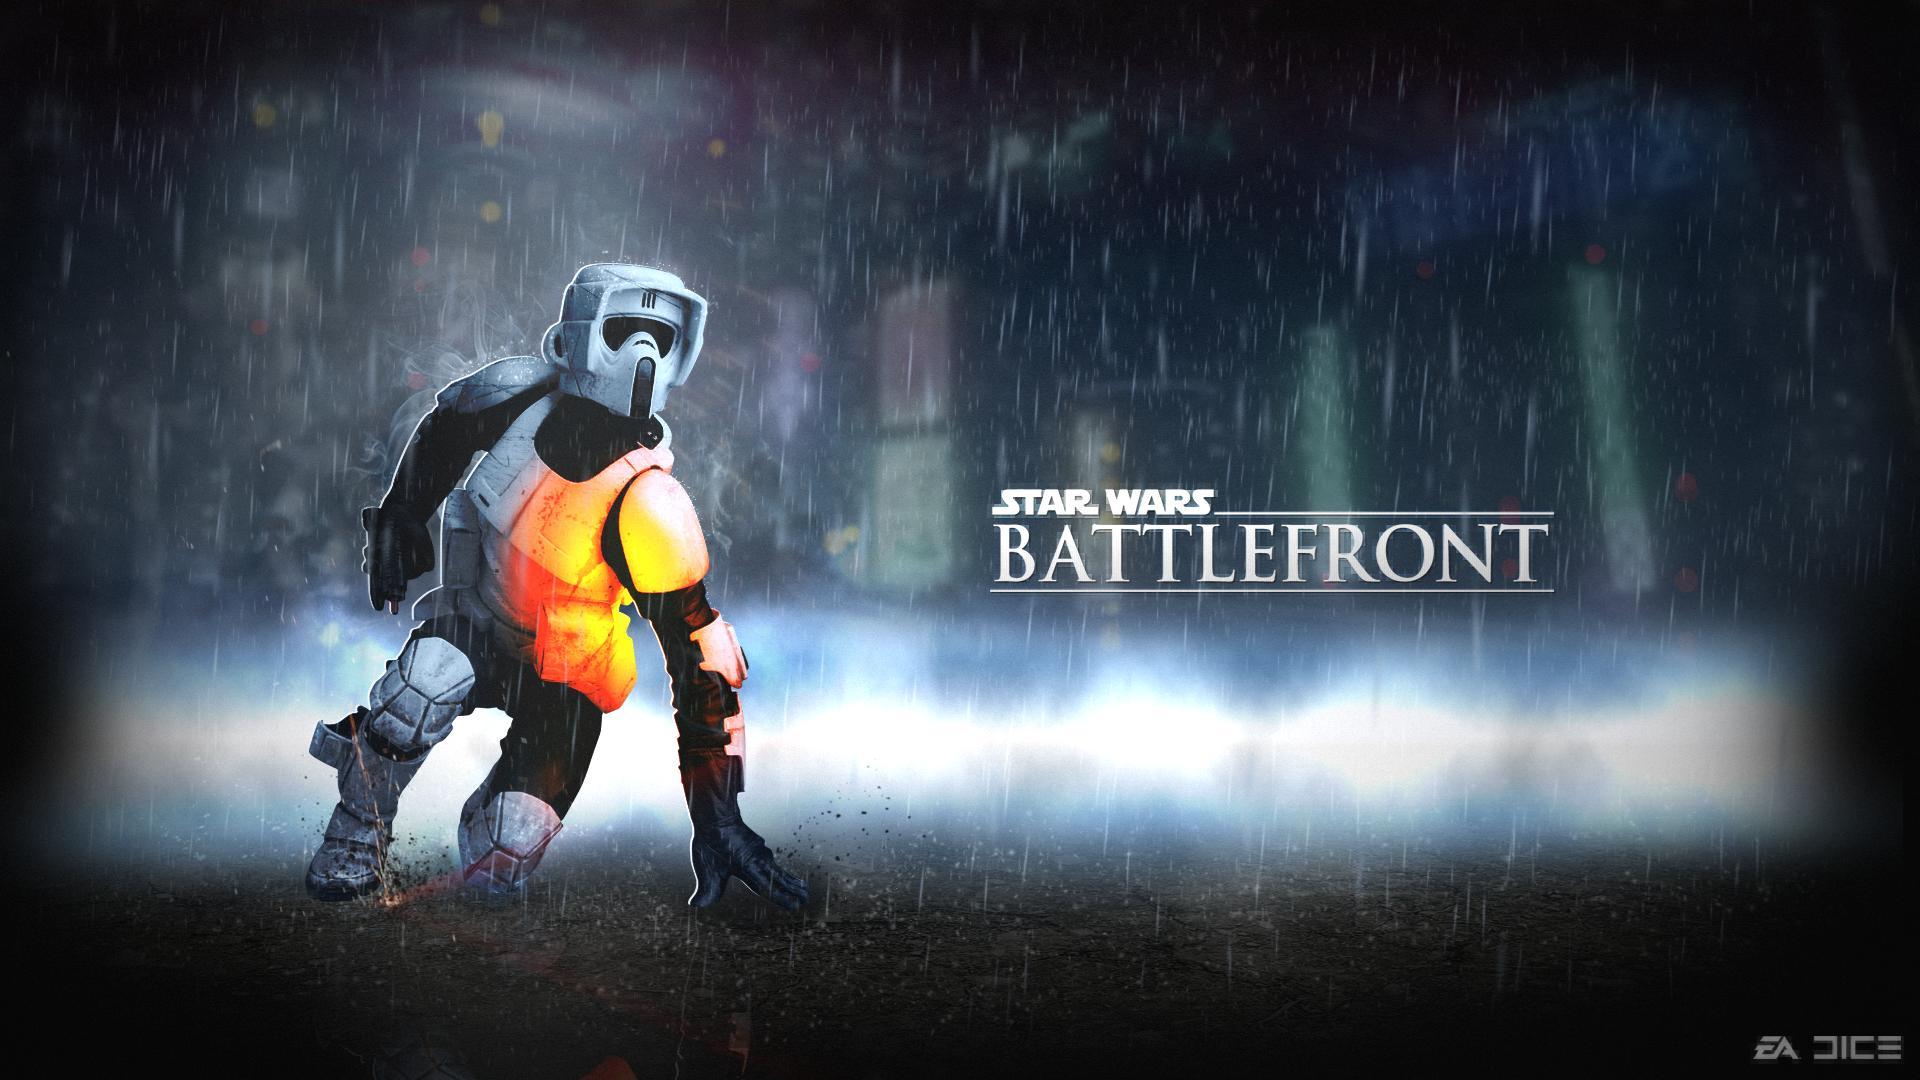 Free Download Star Wars Battlefront Hd Wallpaper Download